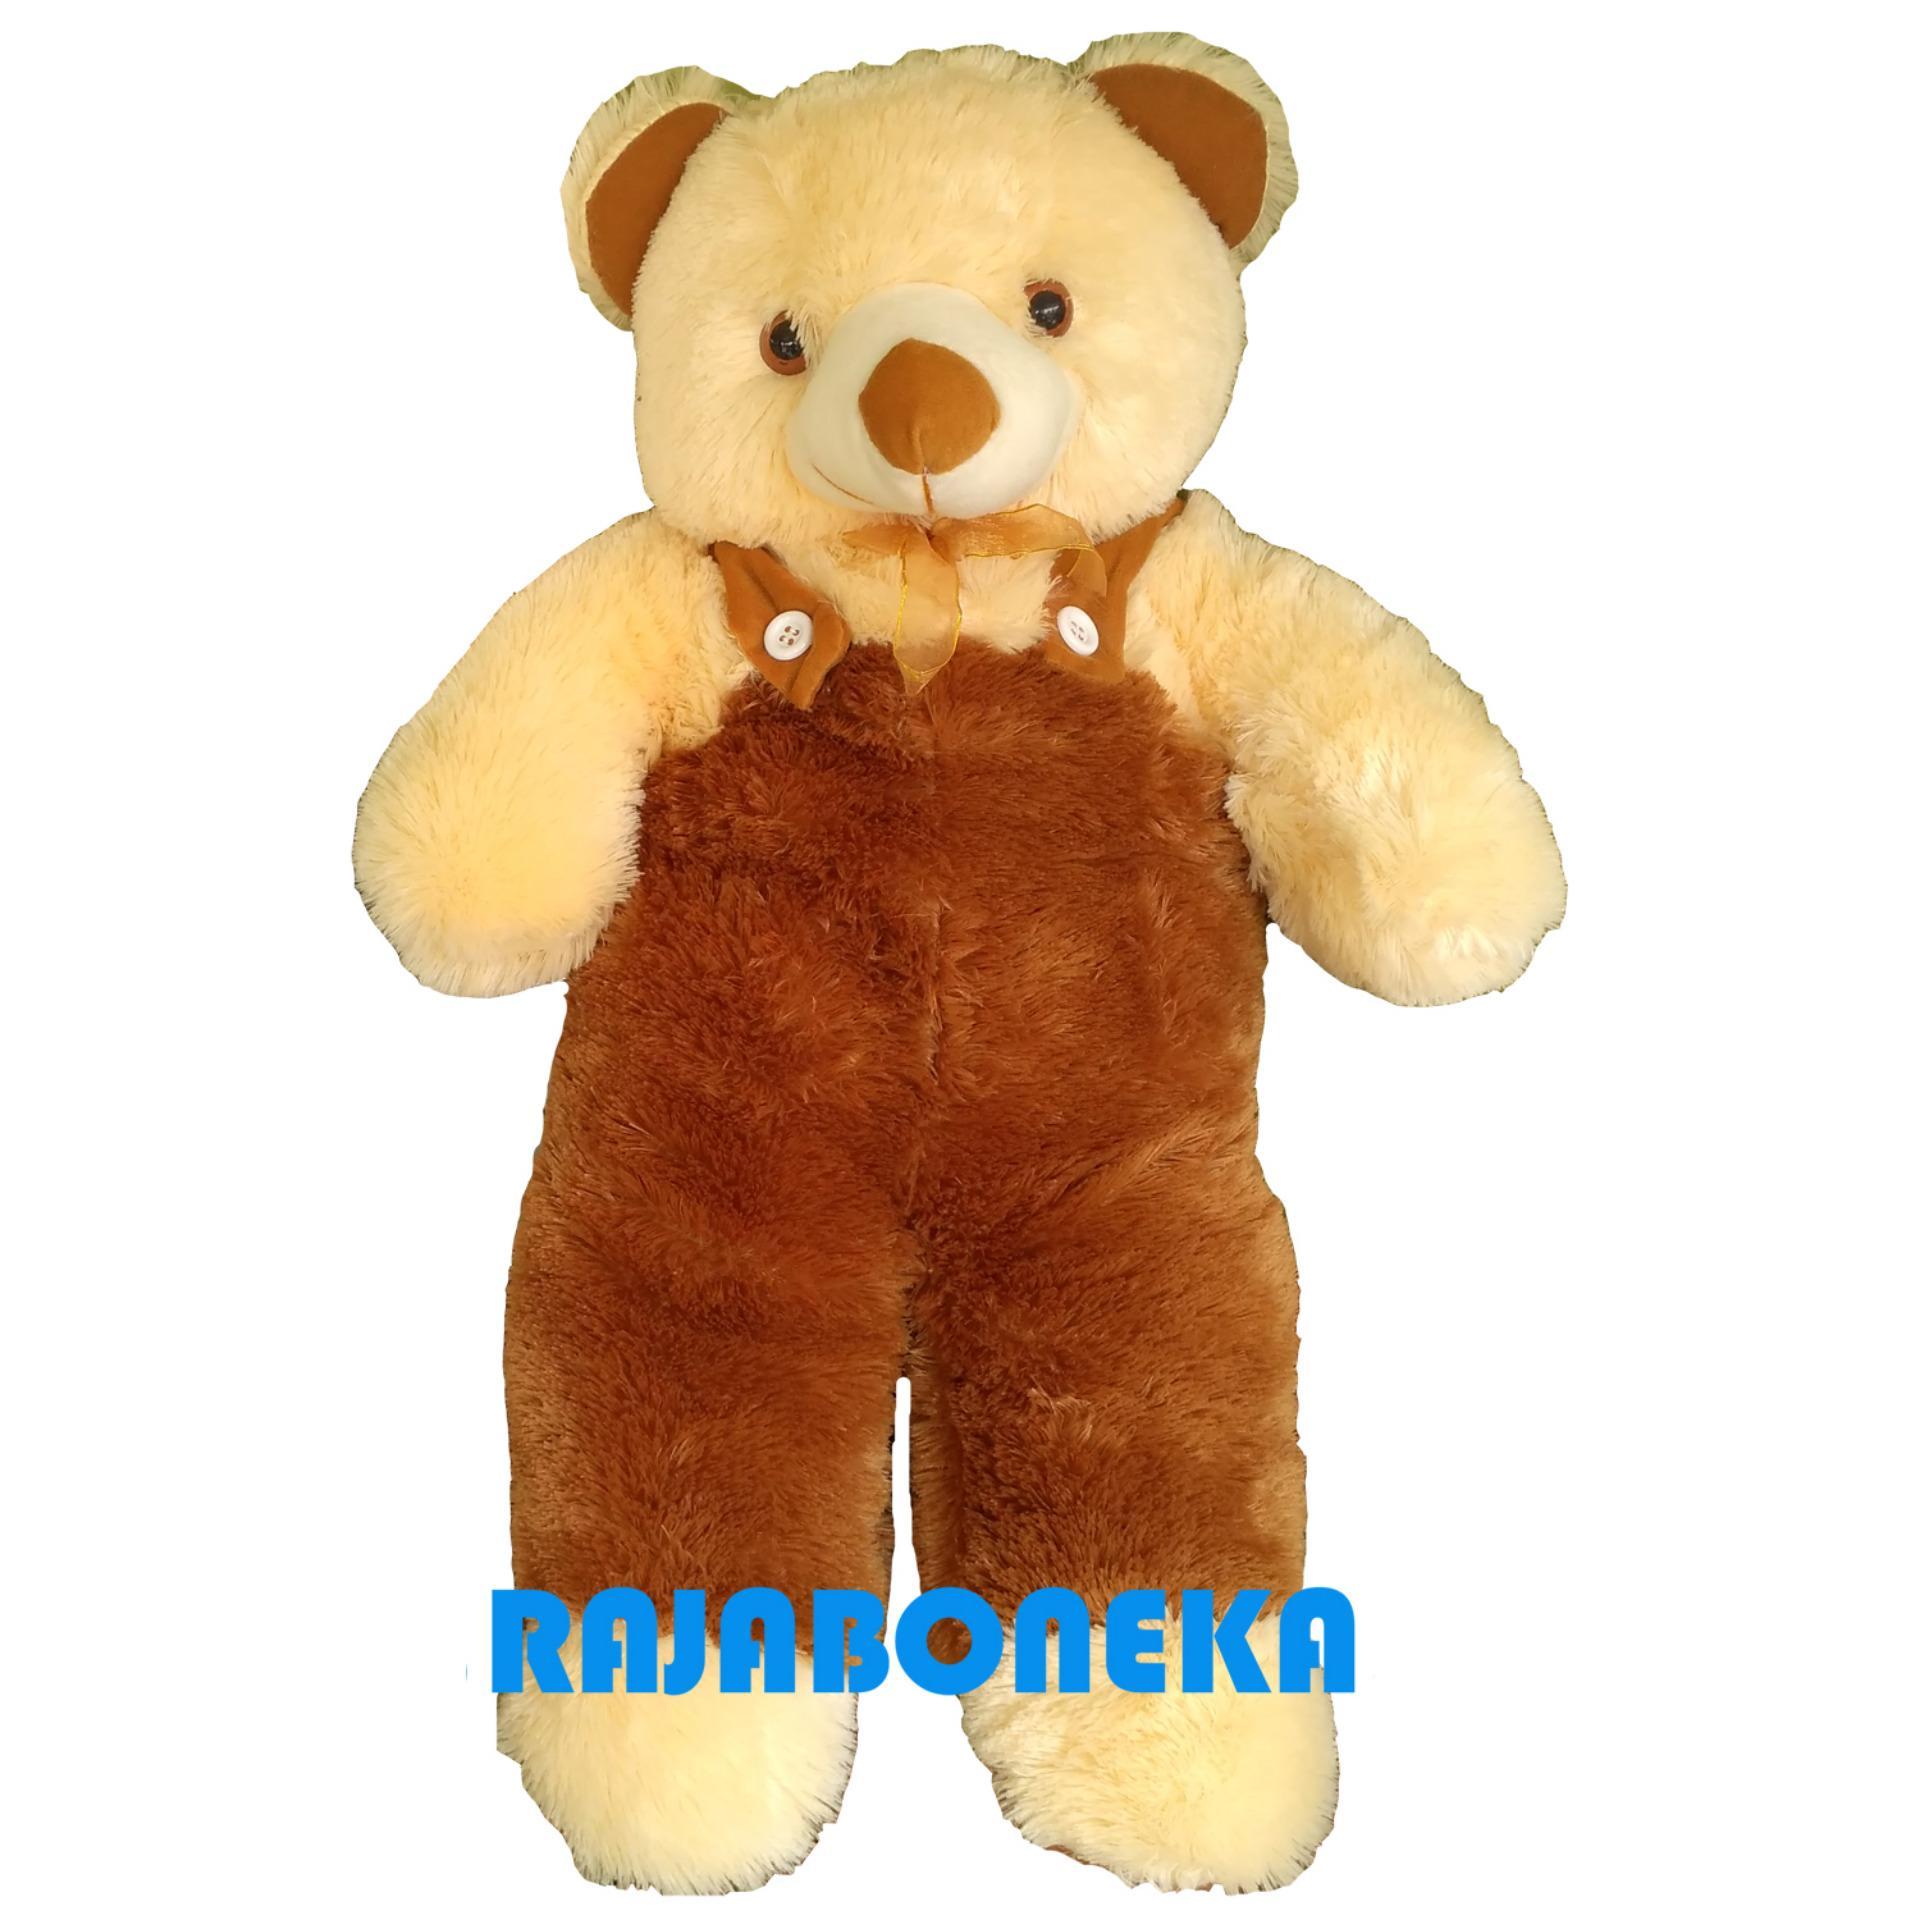 Boneka Beruang Teddy Bear Jojon Jumbo Hijau - Smart4K Design Ideas 98b53f9b58